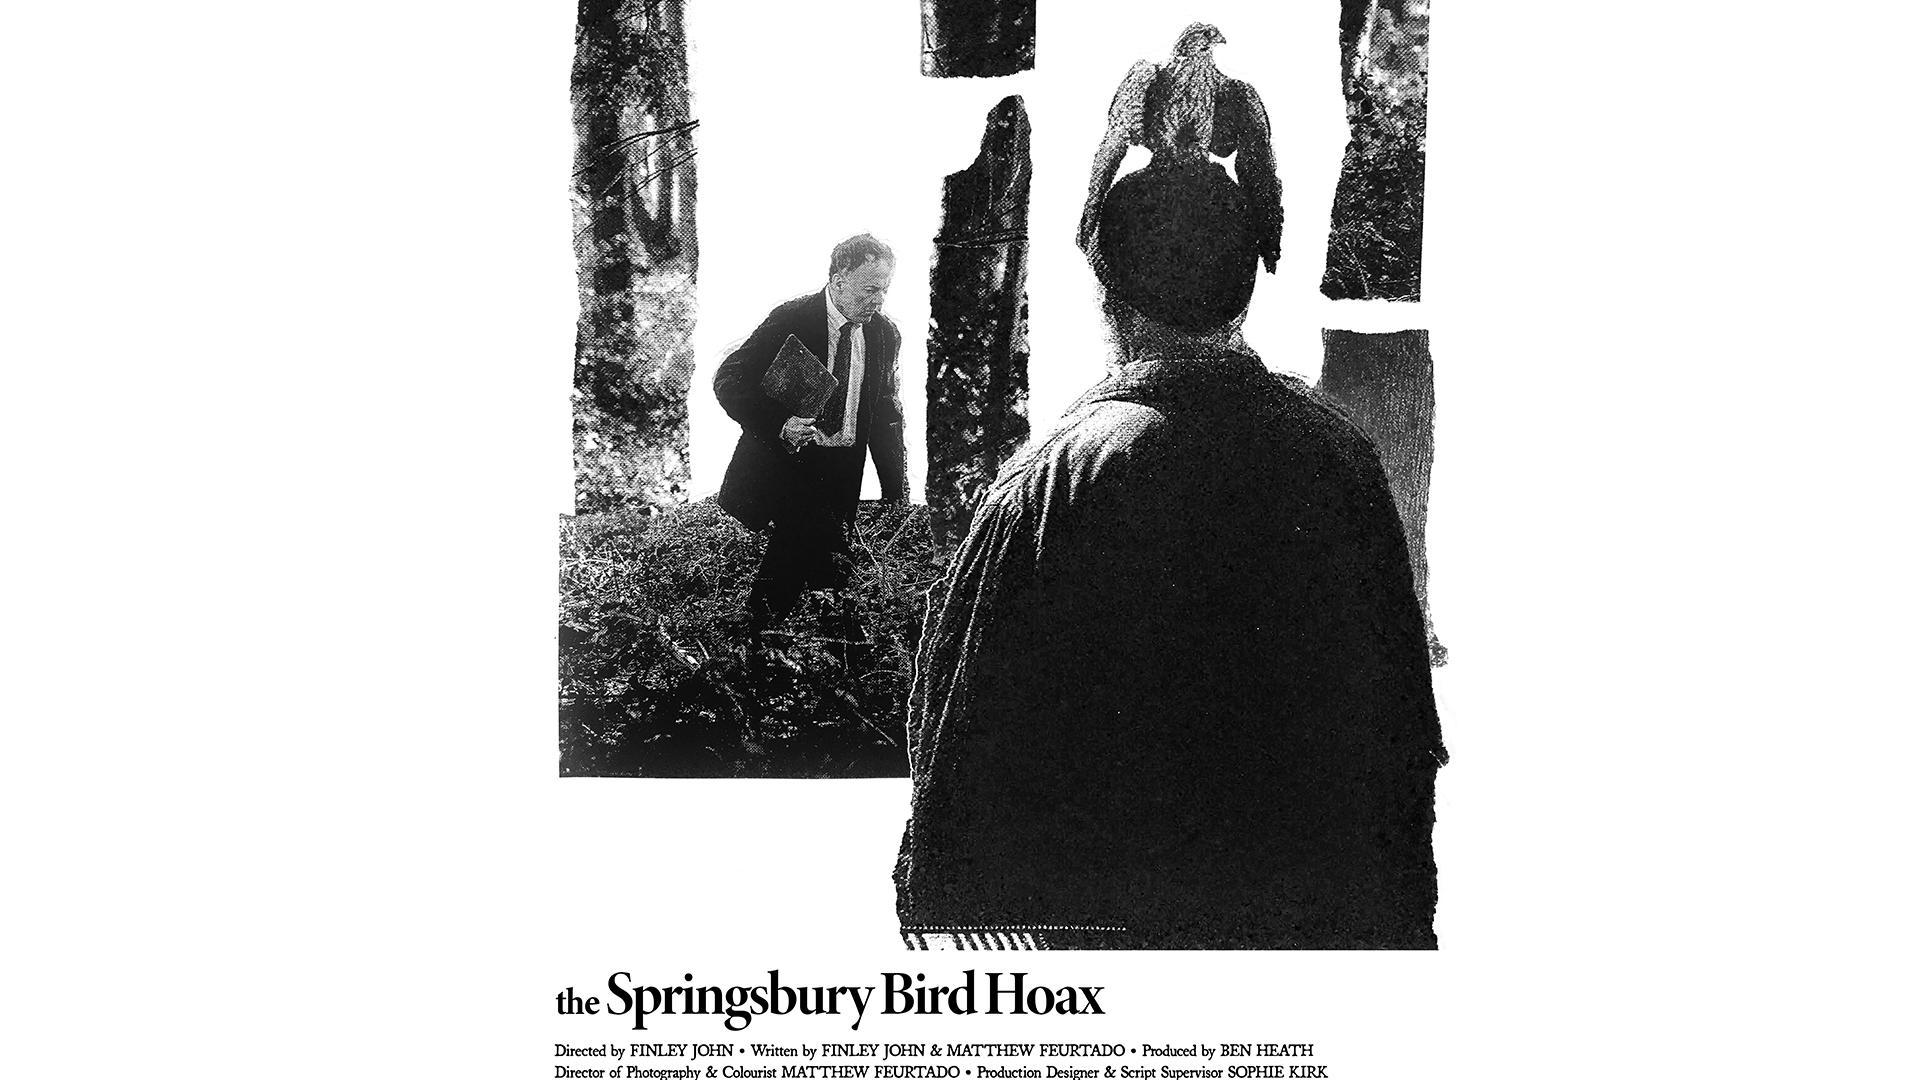 The Springsbury Bird Hoax